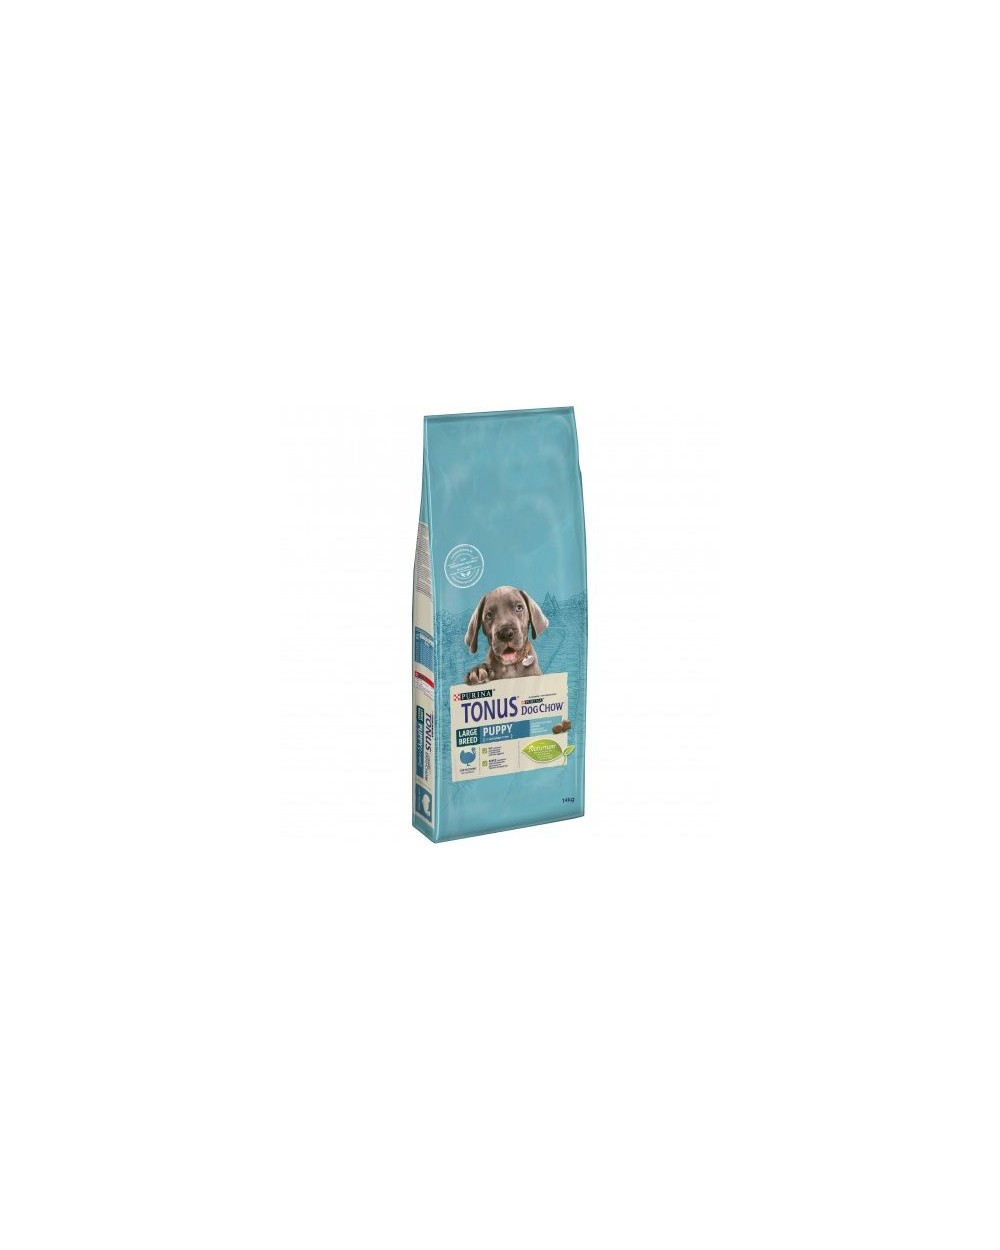 Tonus Dog Chow Puppy Large Breed Tacchino